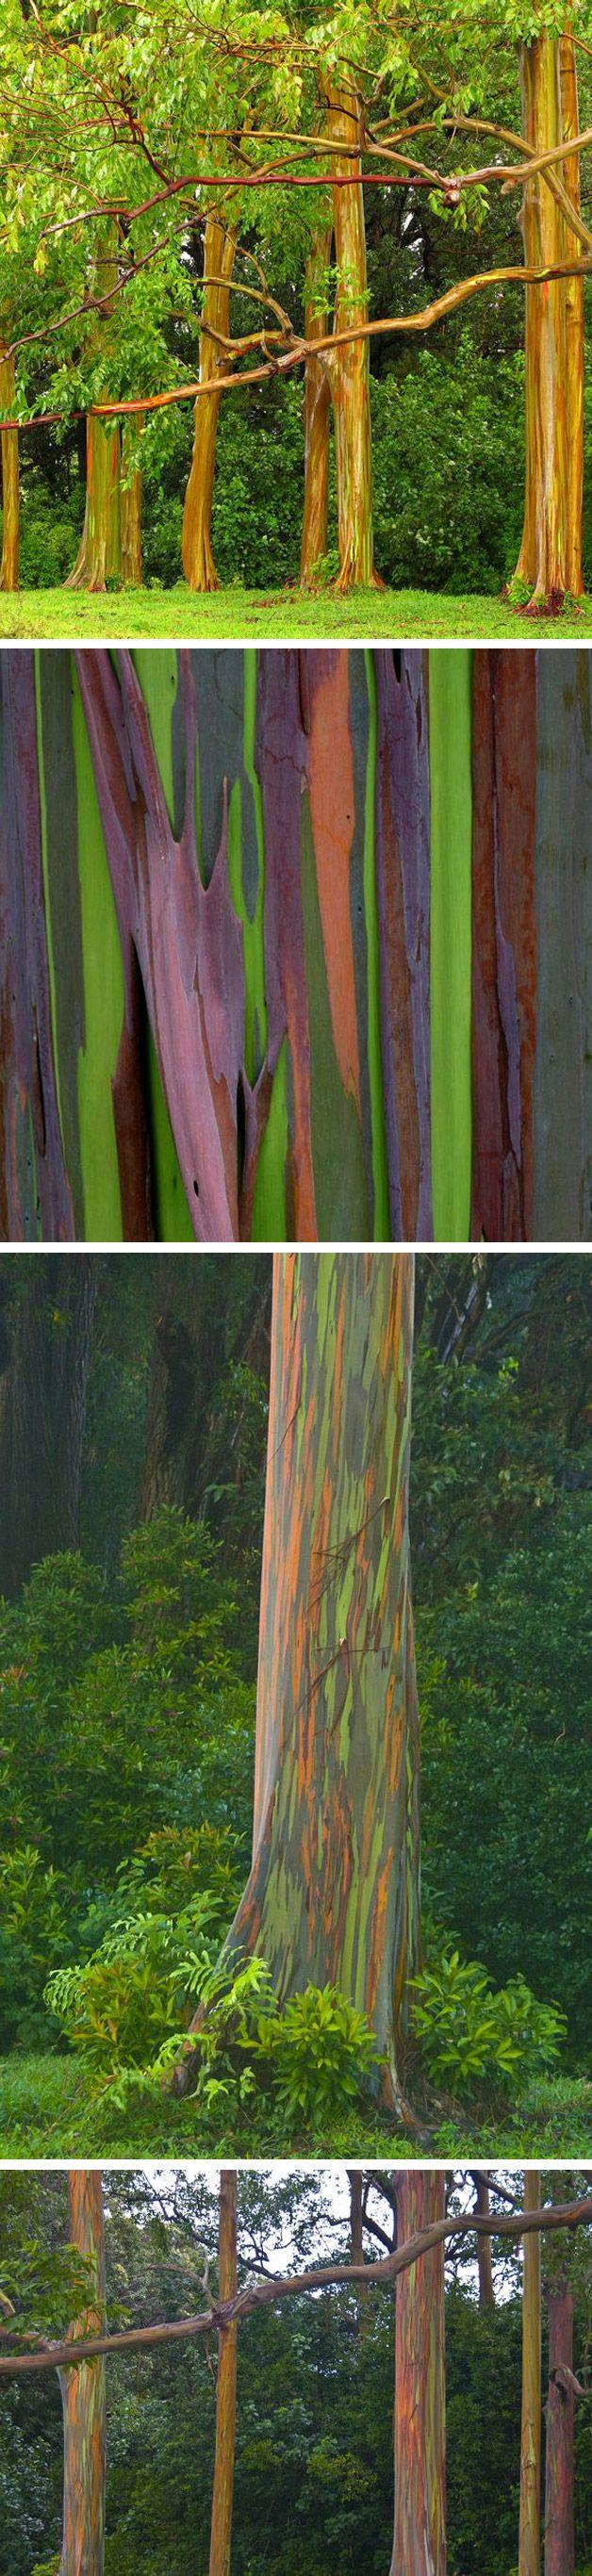 A natureza é sensacional. Uma prova disso é oeucalipto arco-íris(Eucalyptus deglupta)que acada ano que passa, troca sua casca deixando a mostra partes internas coloridas.